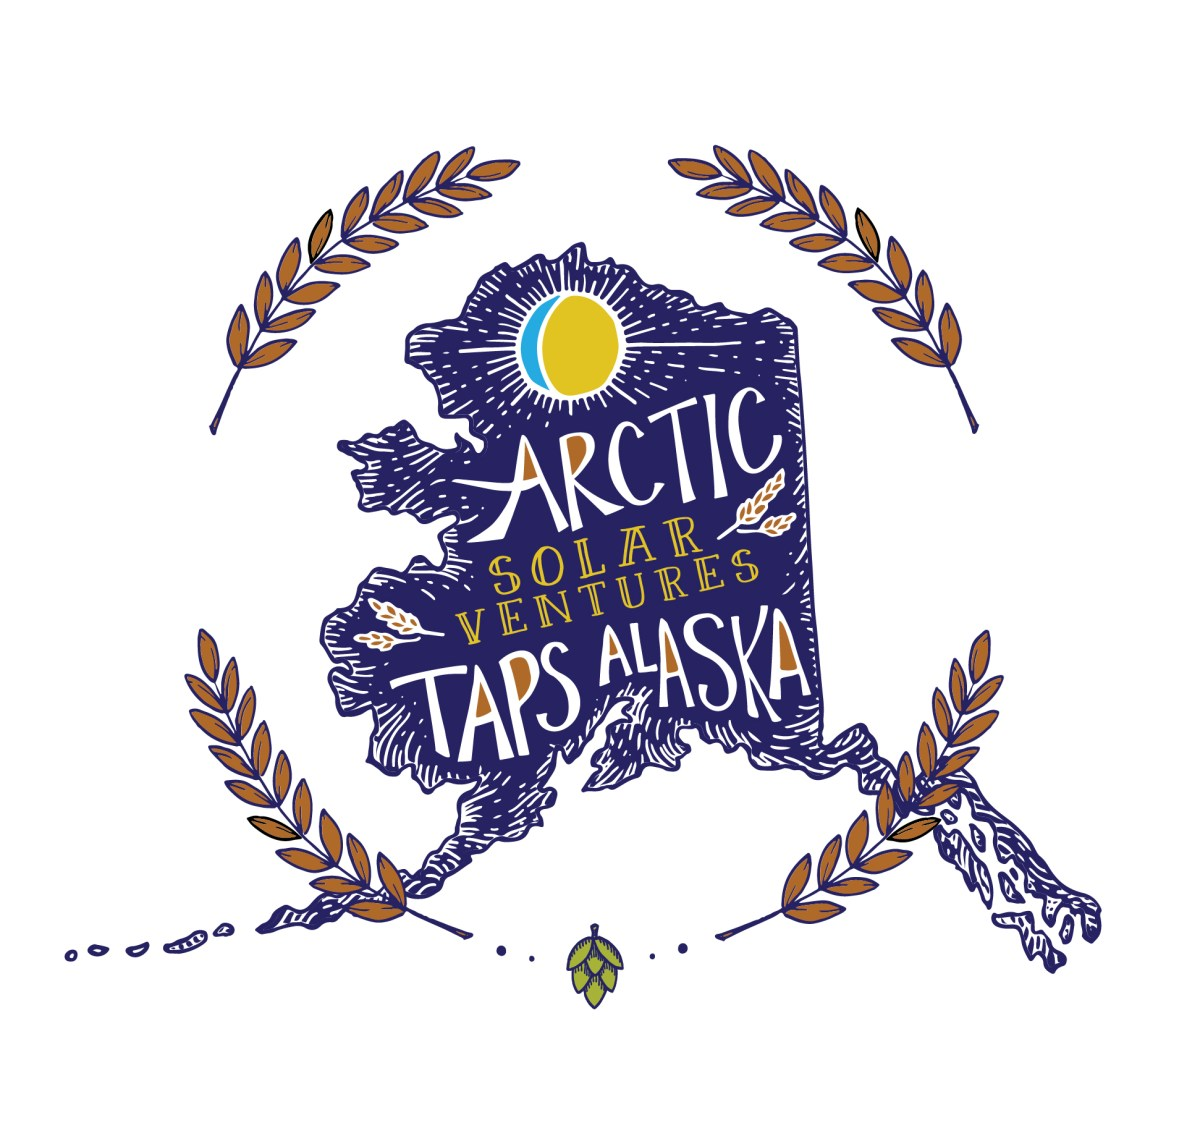 Arctic Solar Ventures Taps Alaska